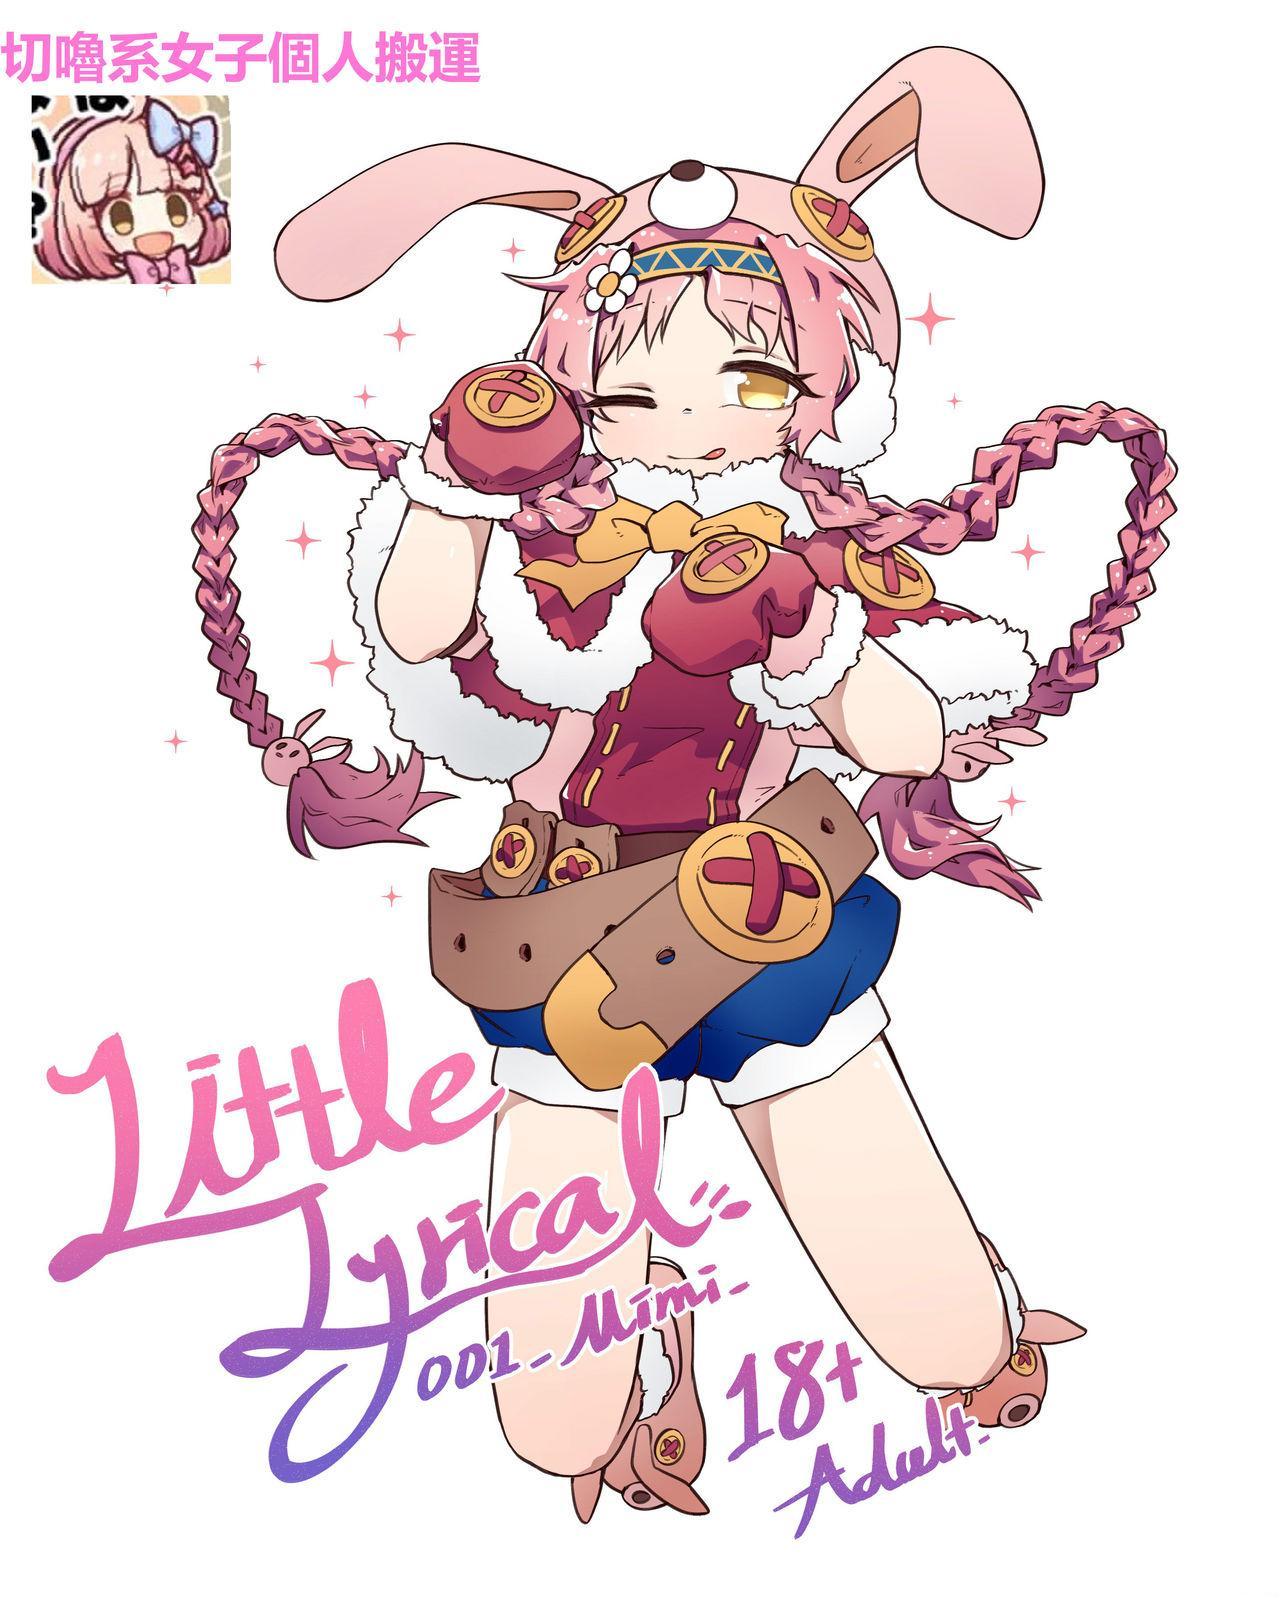 [MountainHan(山含)] Little Lyrical-MiMi 001 (Princess Connect! Re:Dive) [Chinese] [切嚕系女子個人搬運] [Decensored] +小宣傳 0